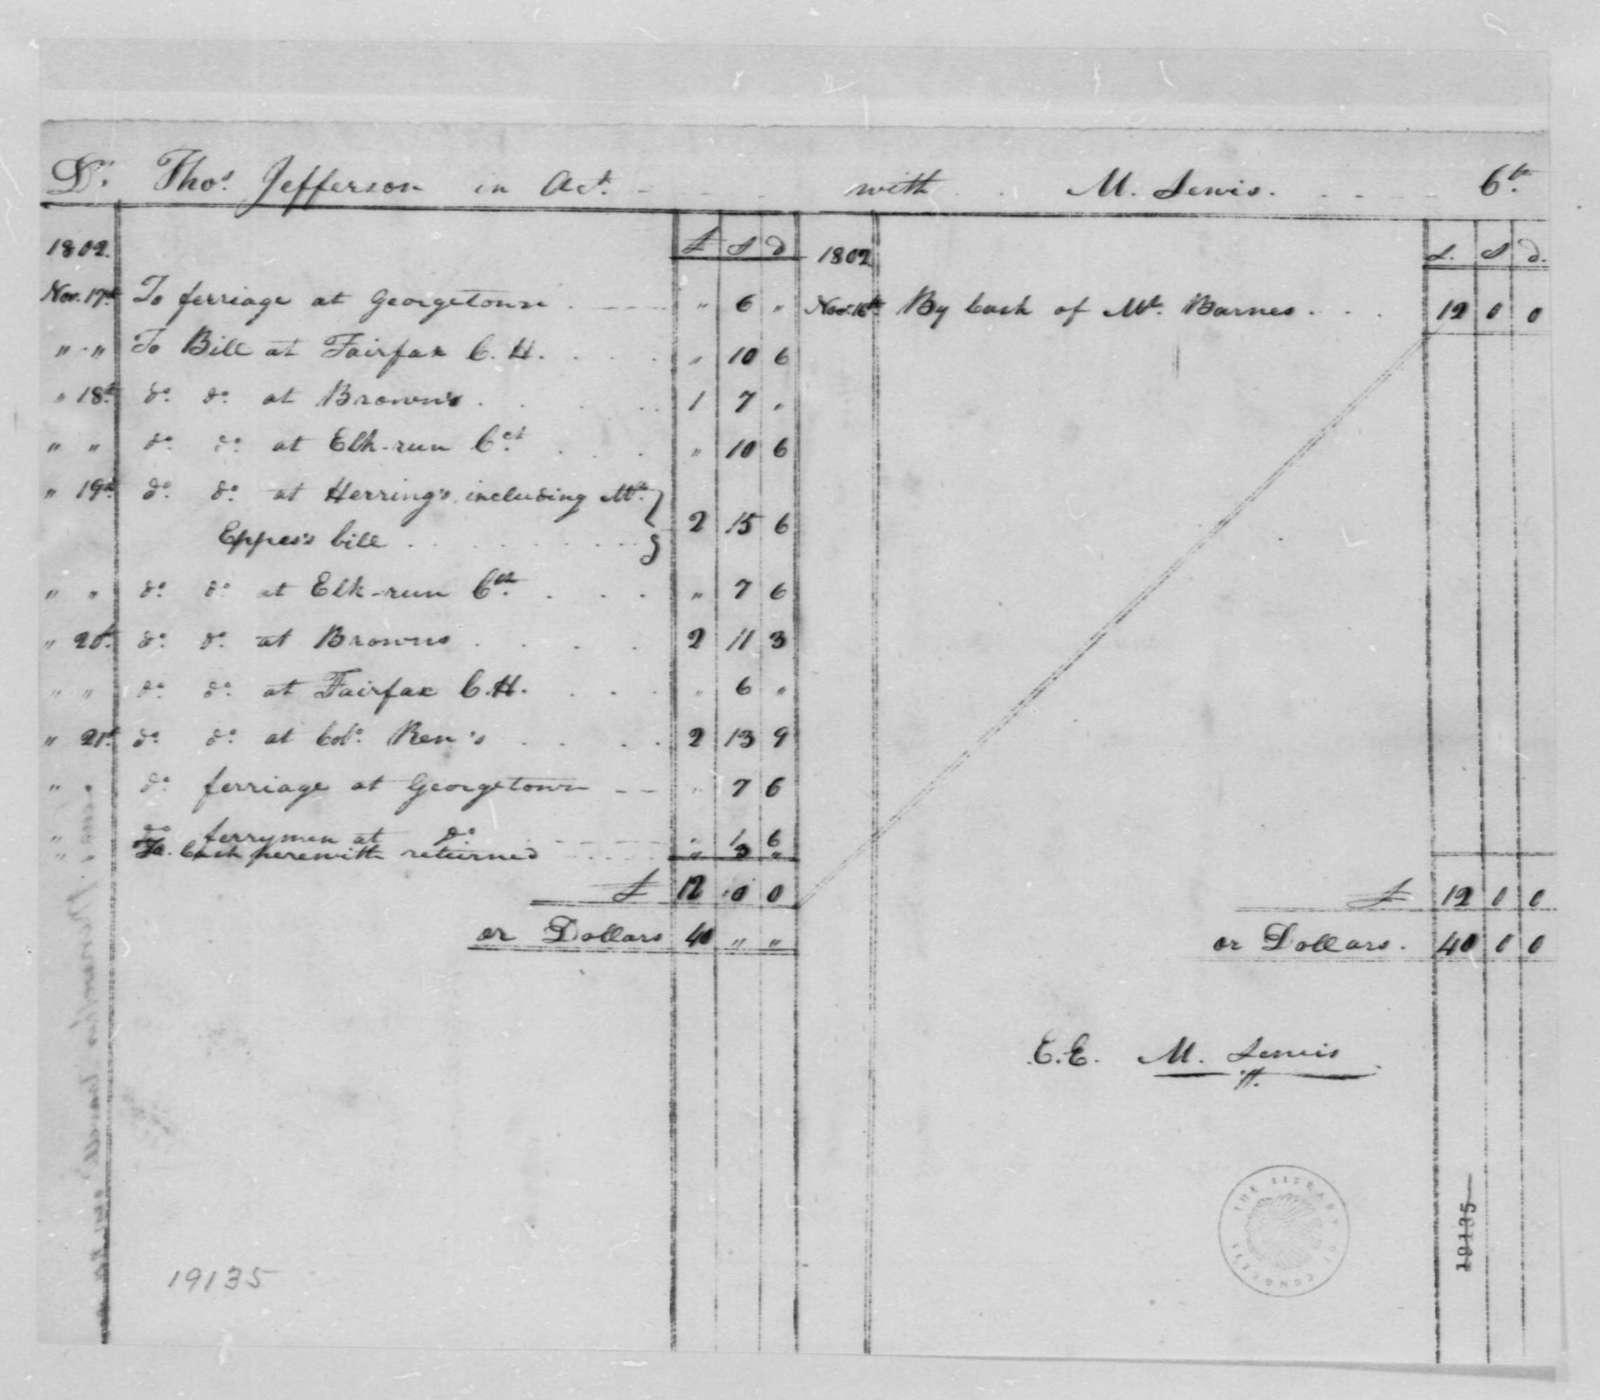 Thomas Jefferson, November 1802, Account with M. Lewis